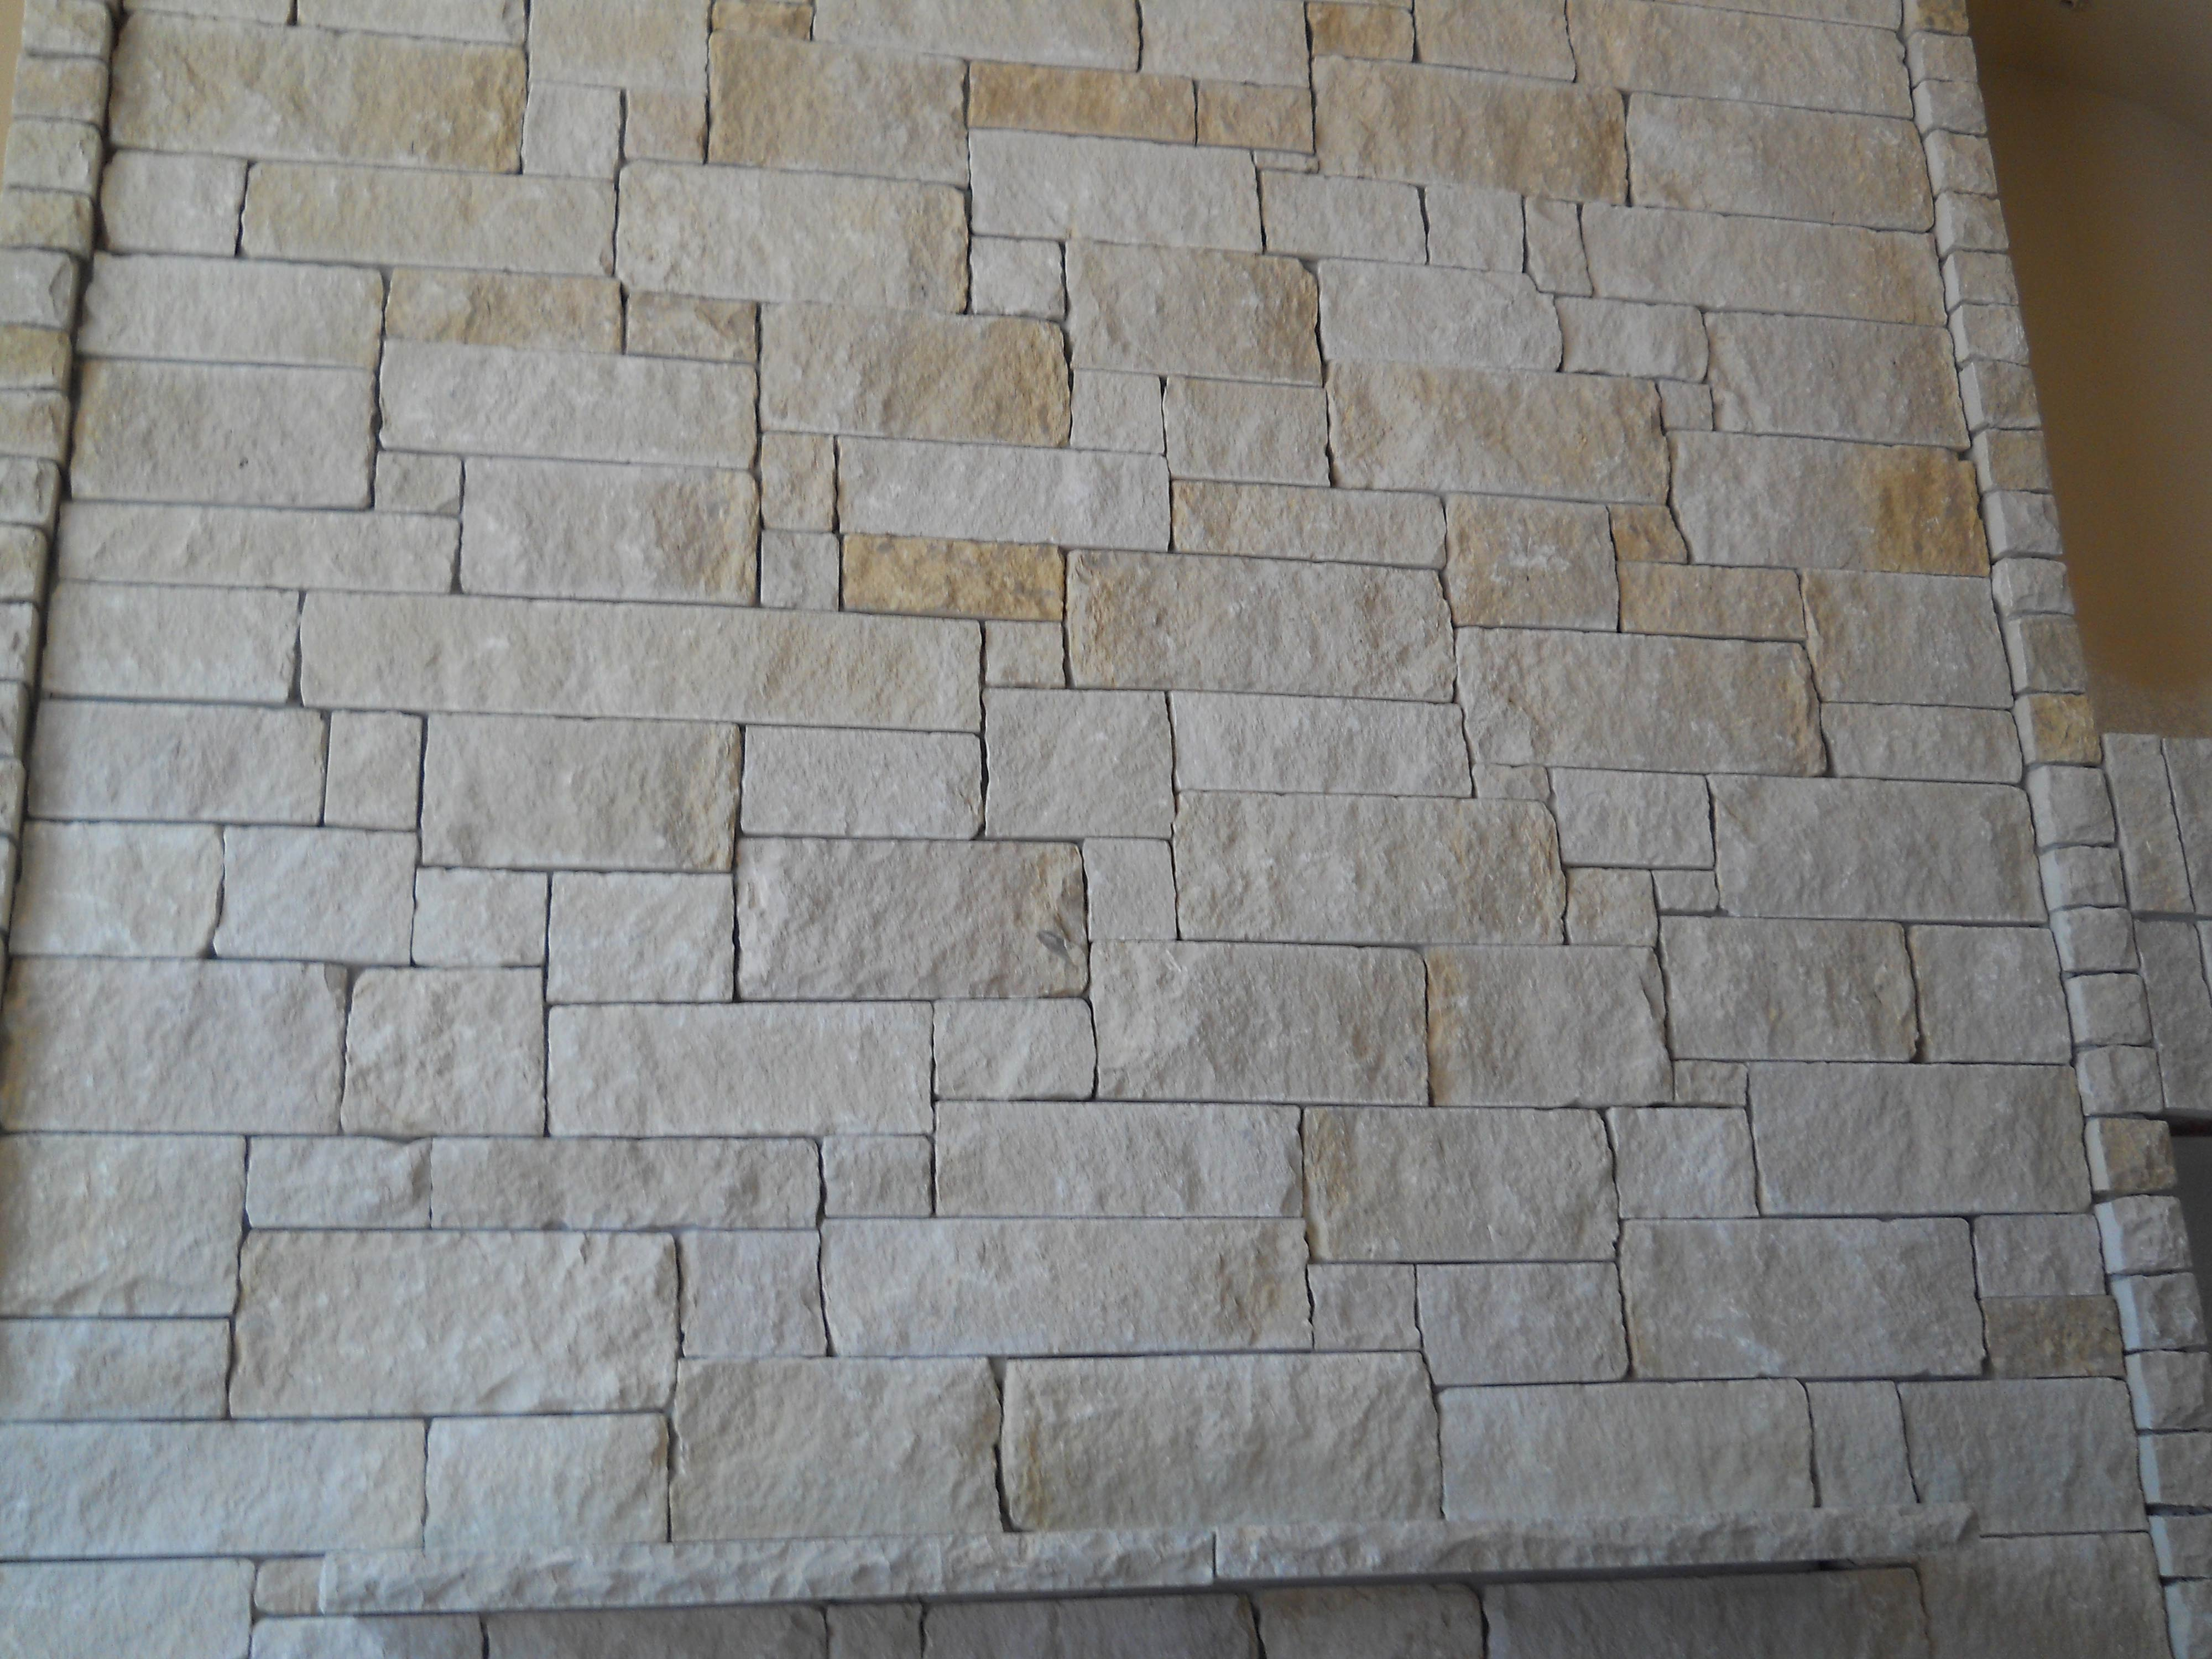 Brick Veneer Interior Wall